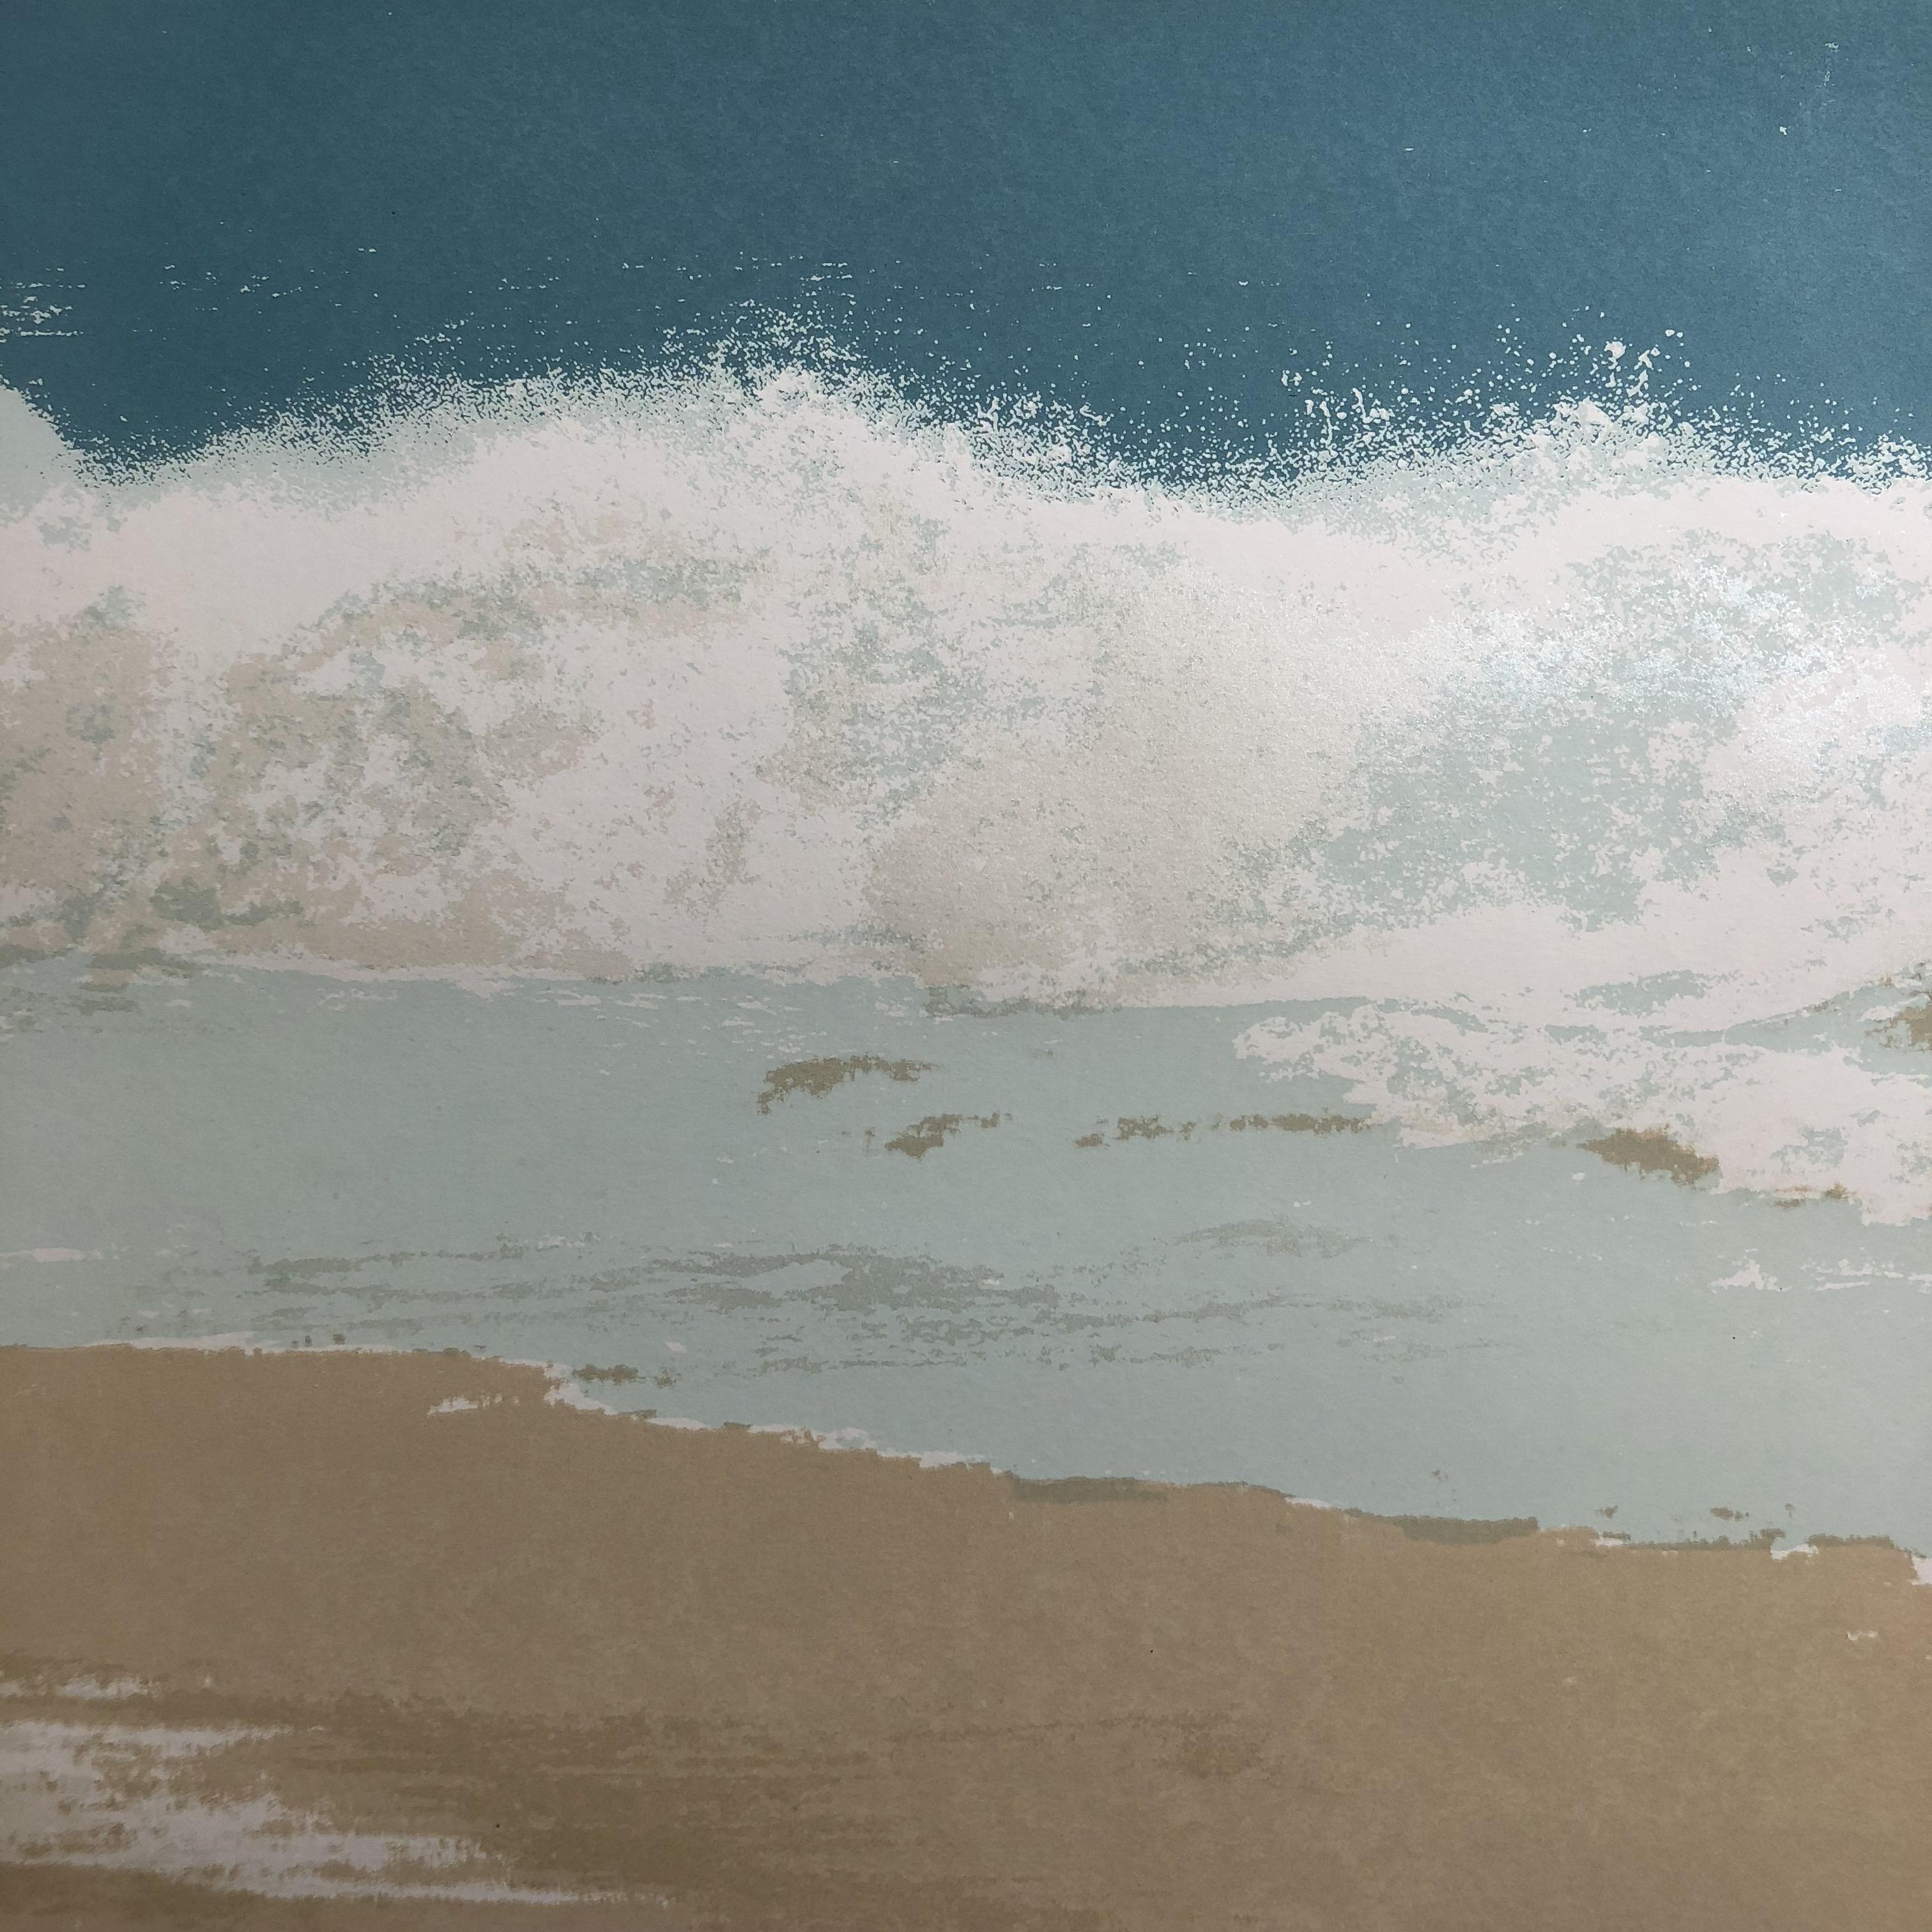 Waves screen print